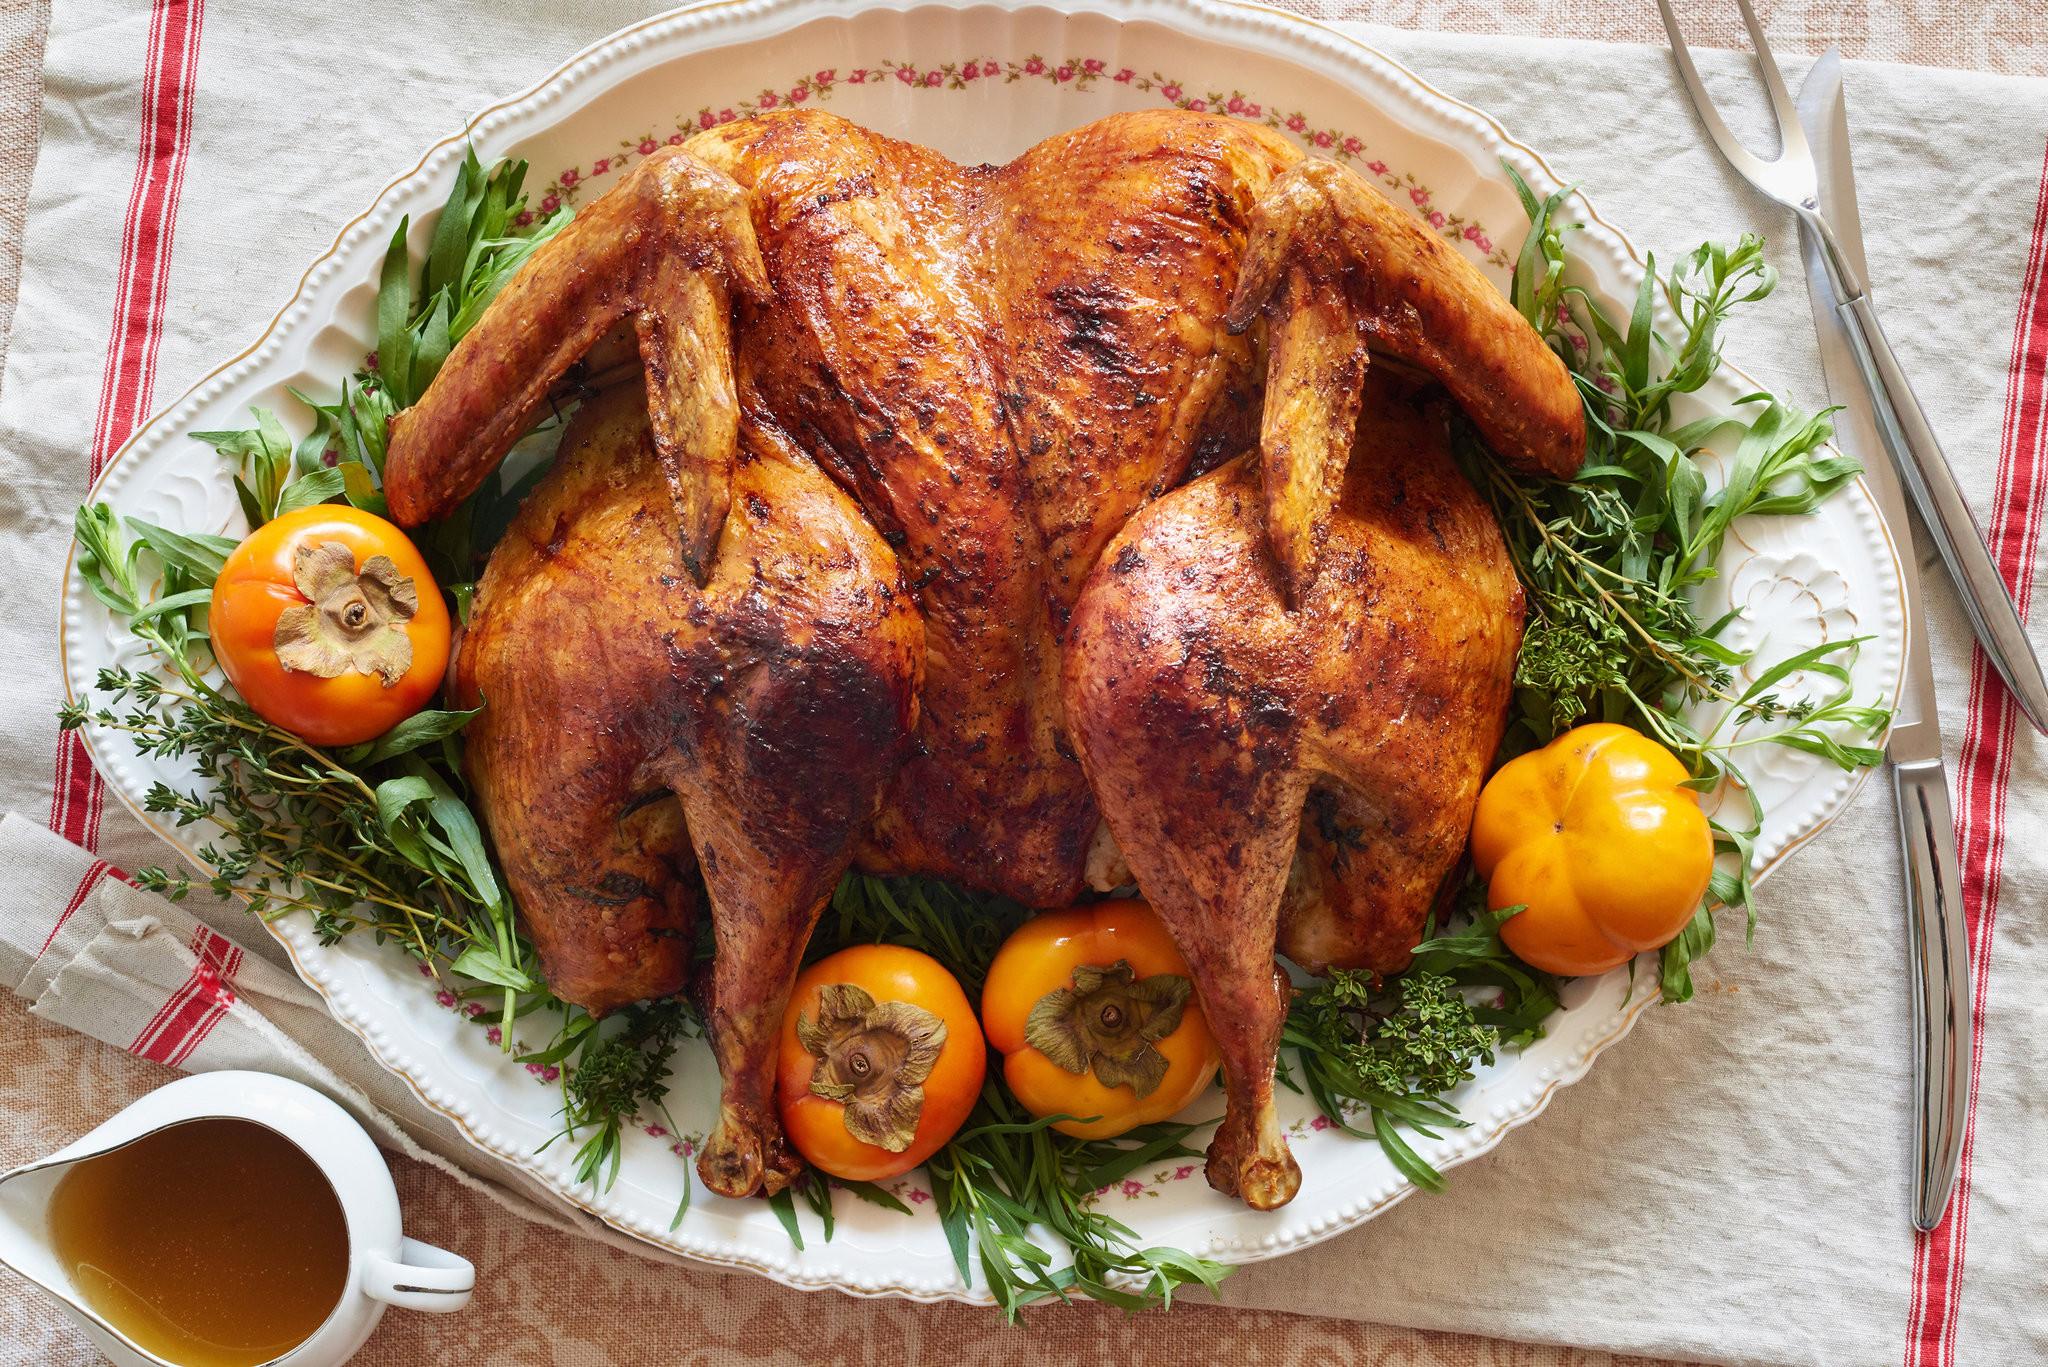 Best Turkey Recipe For Thanksgiving  45 Minute Roast Turkey Recipe NYT Cooking